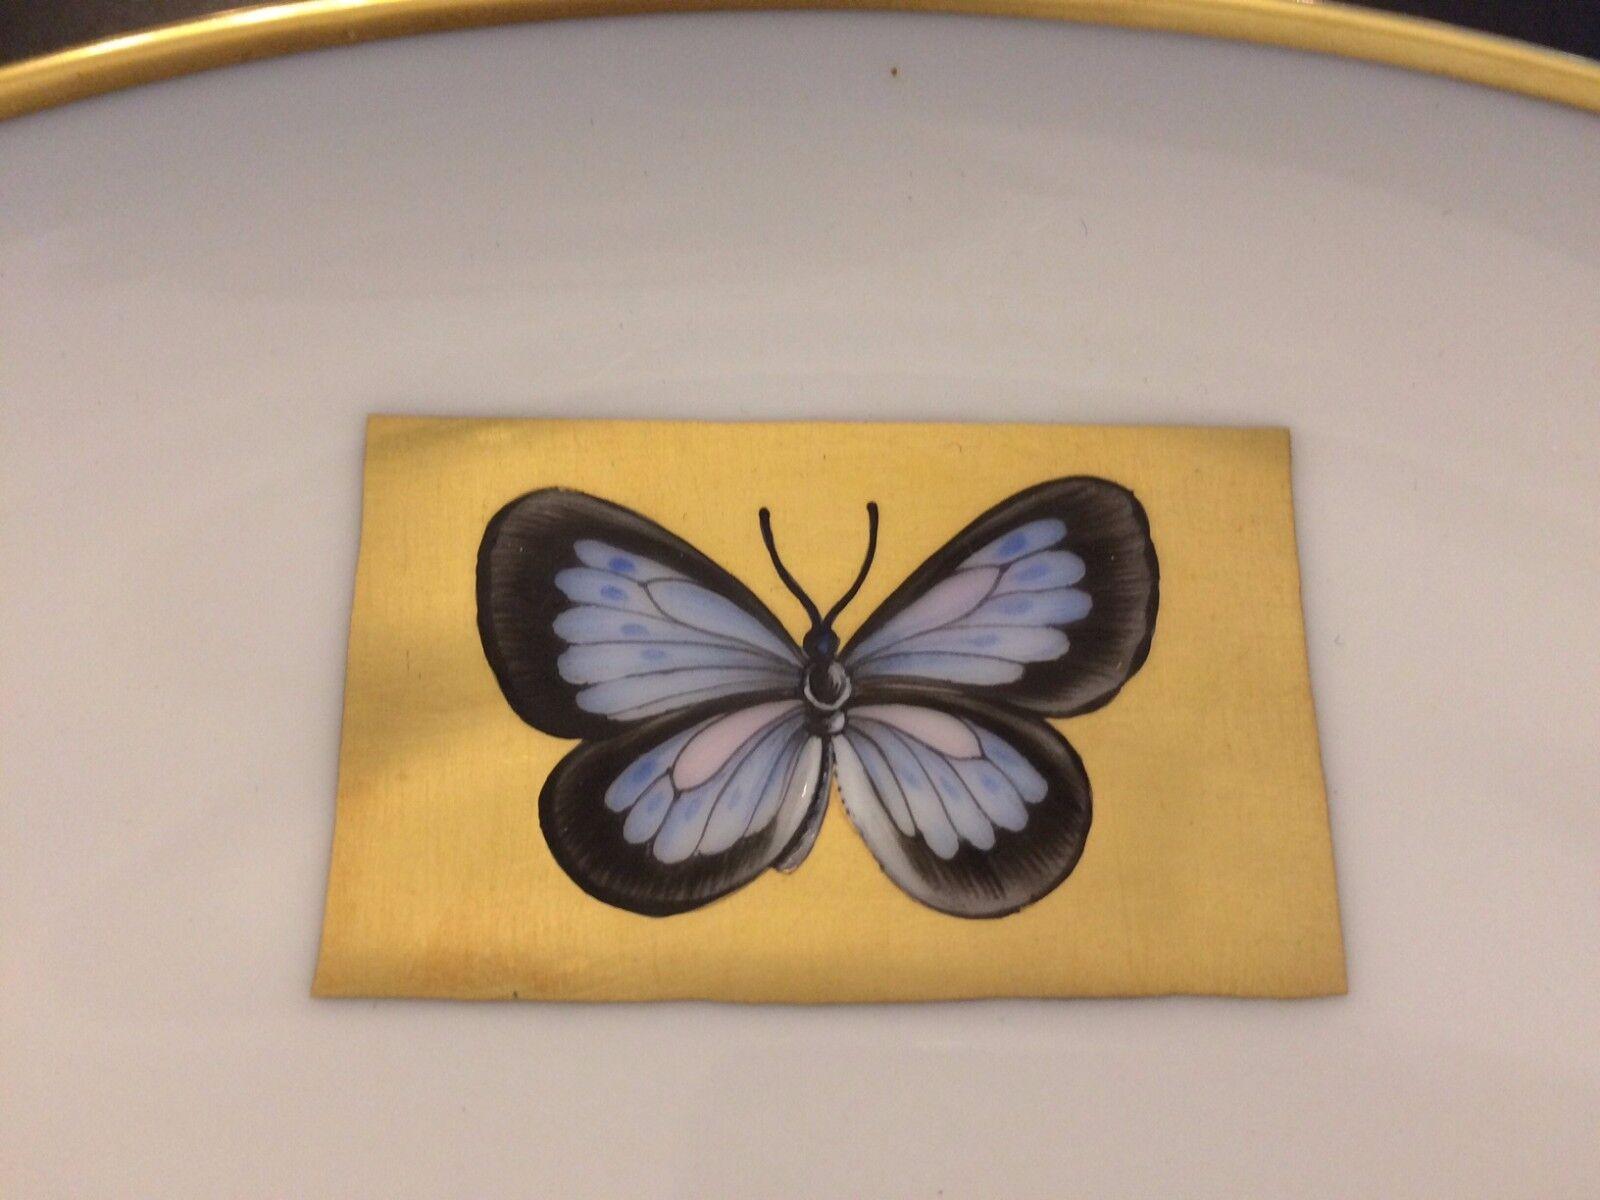 Herend Ungarn Teller handbemalt Schmetterling Butterfly Goldrand Hermitage 27 cm | Flagship-Store